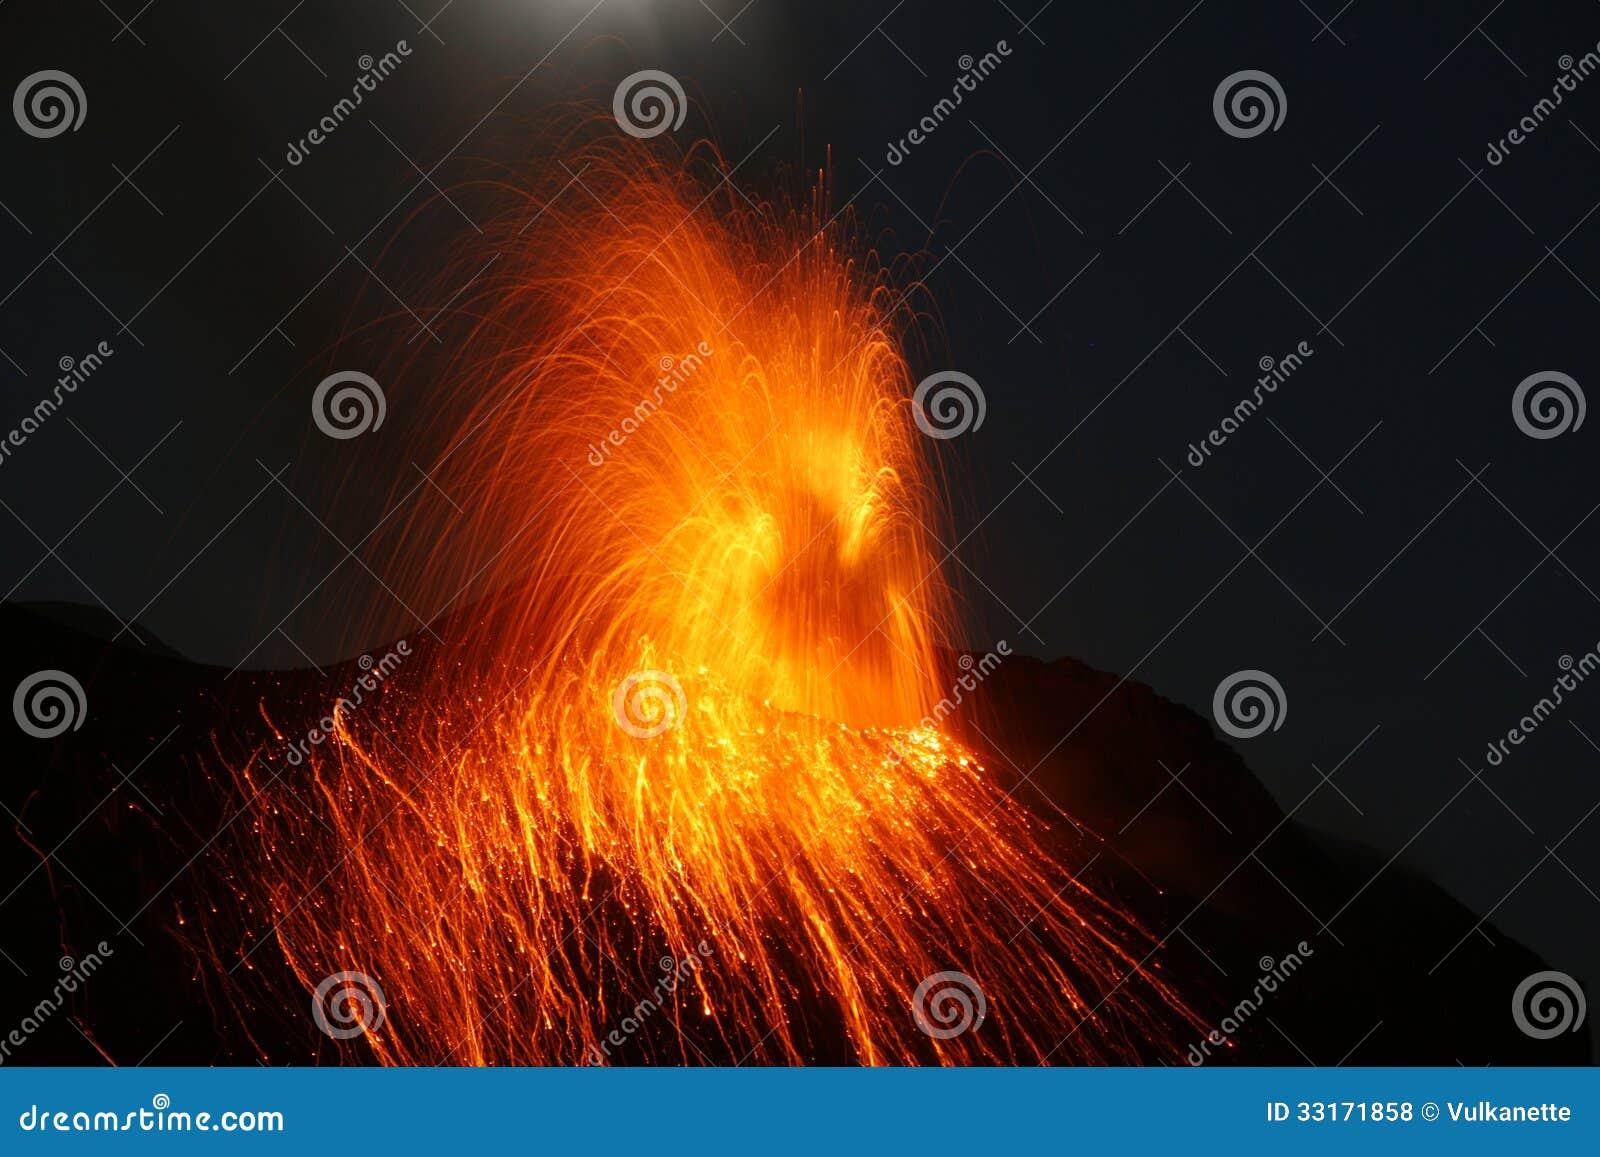 Free Clipart Volcano Erupting